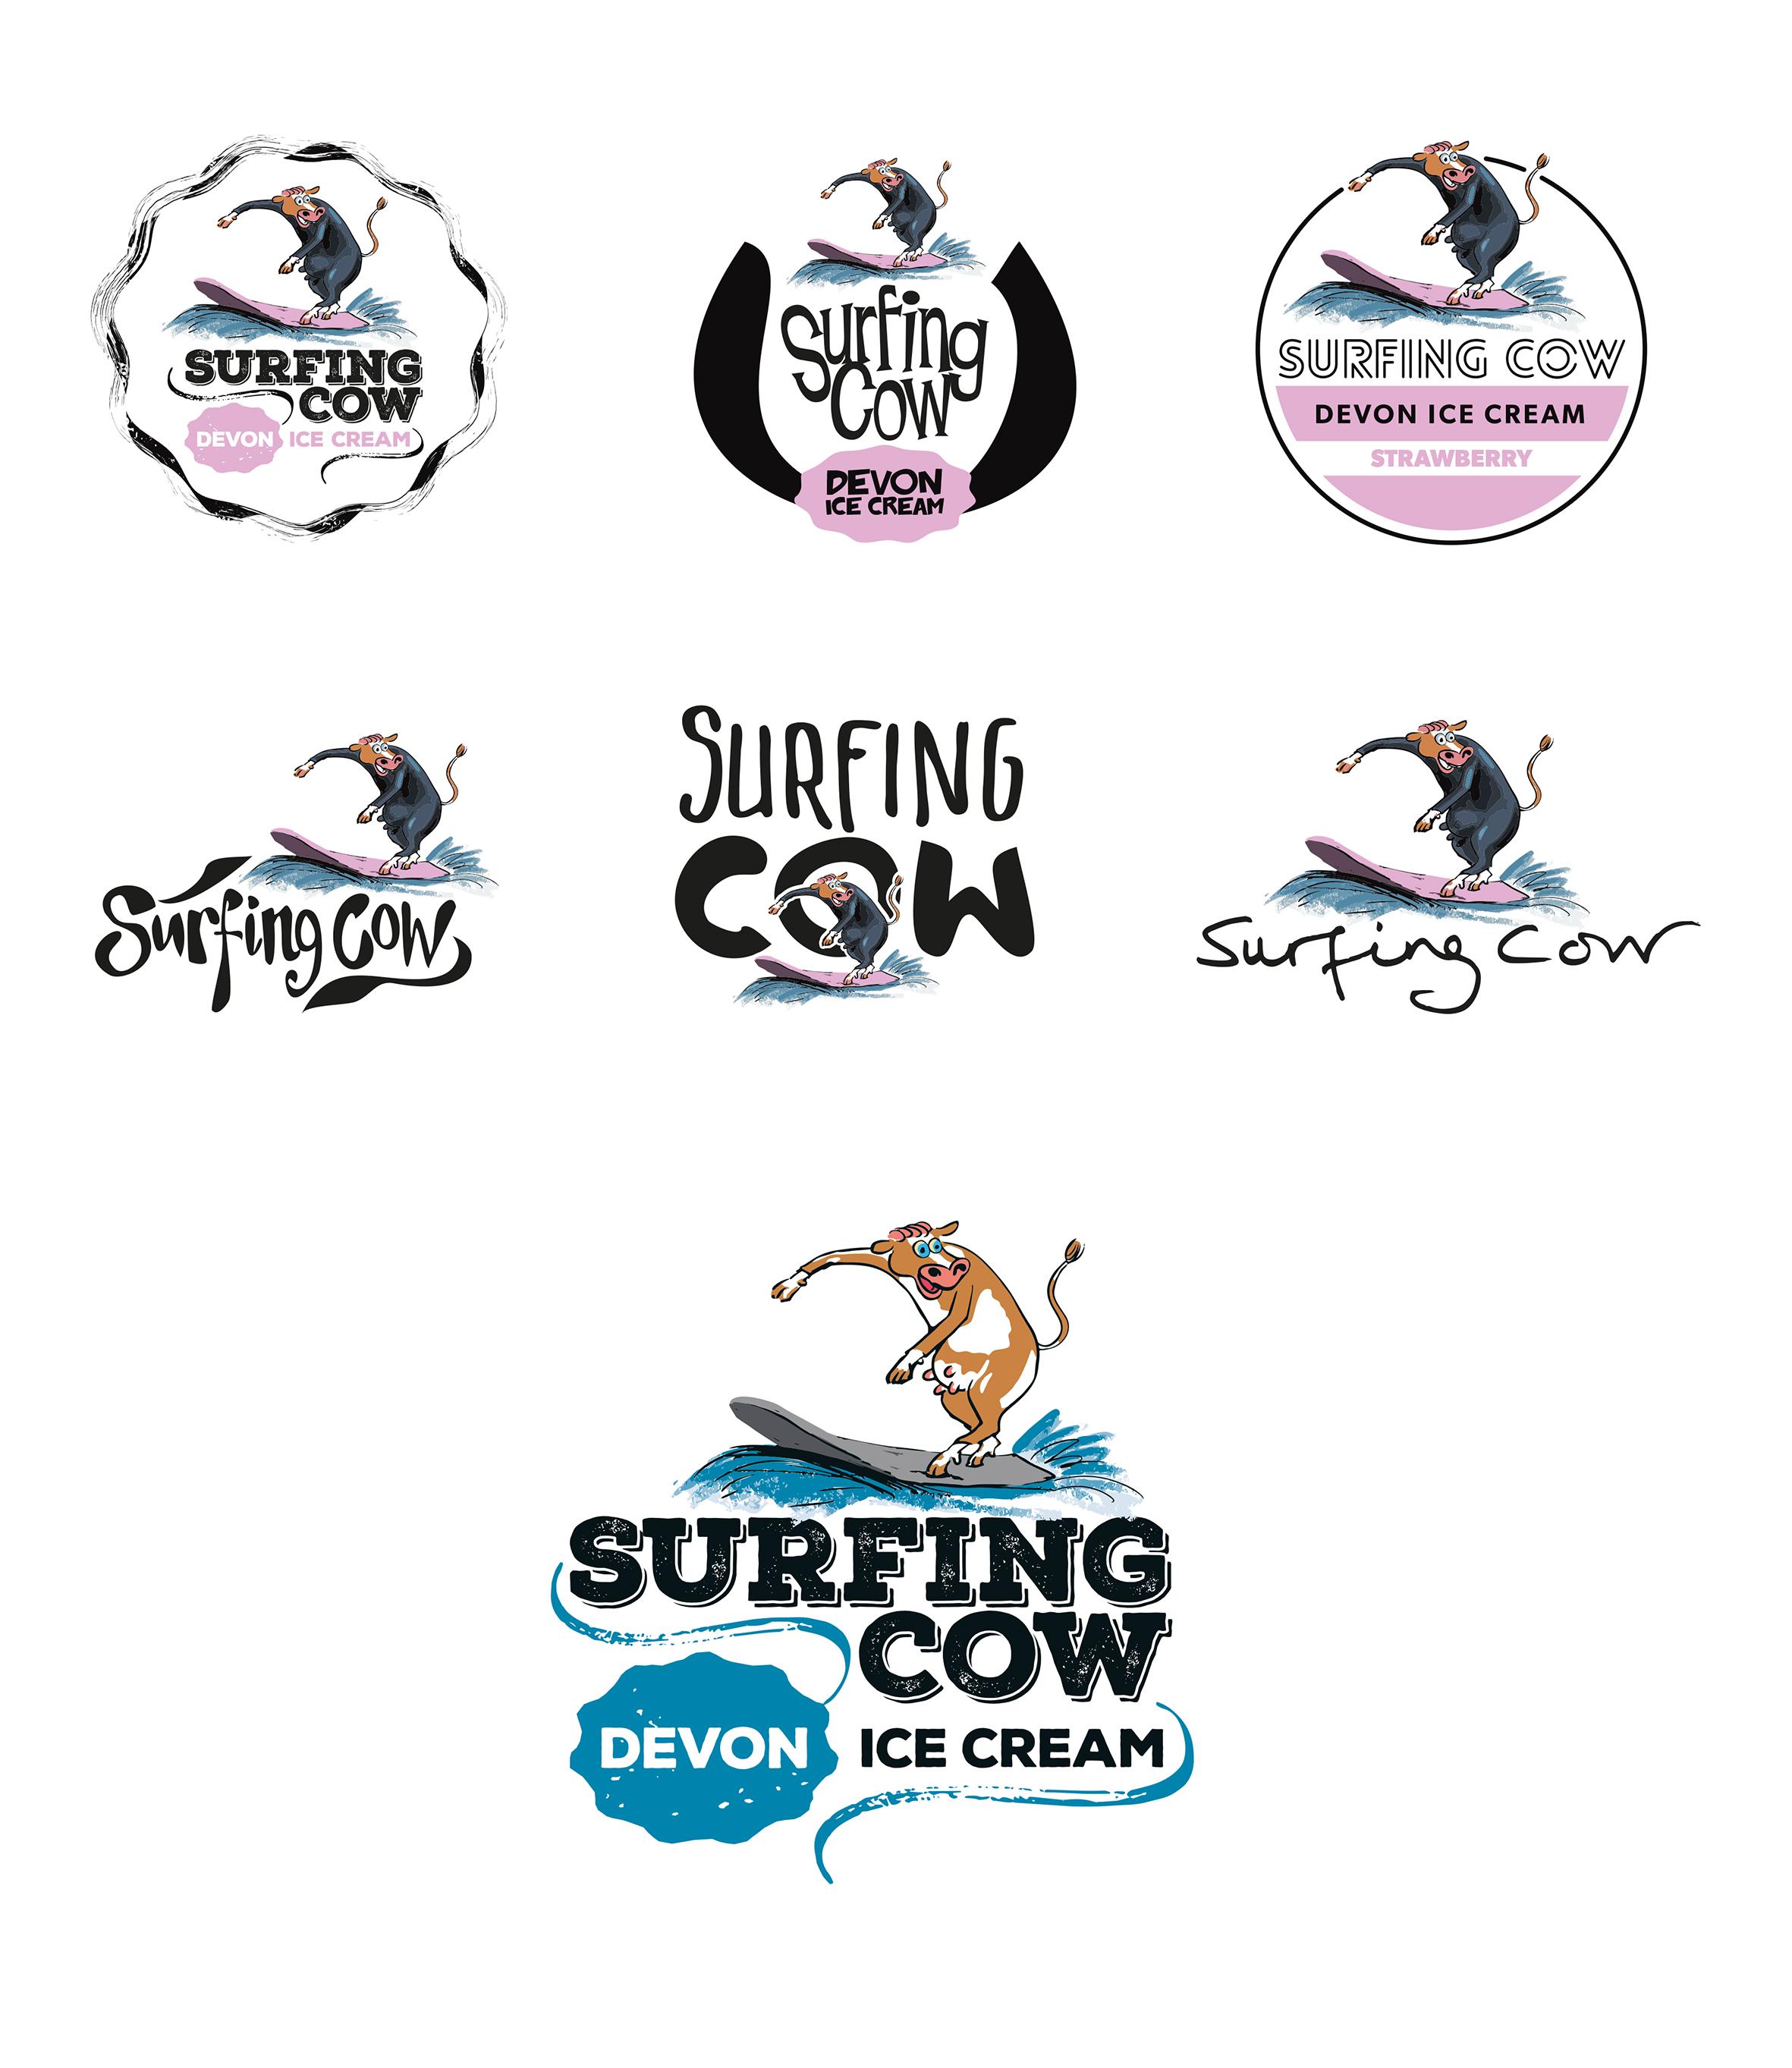 Surfing Cow Ice Cream